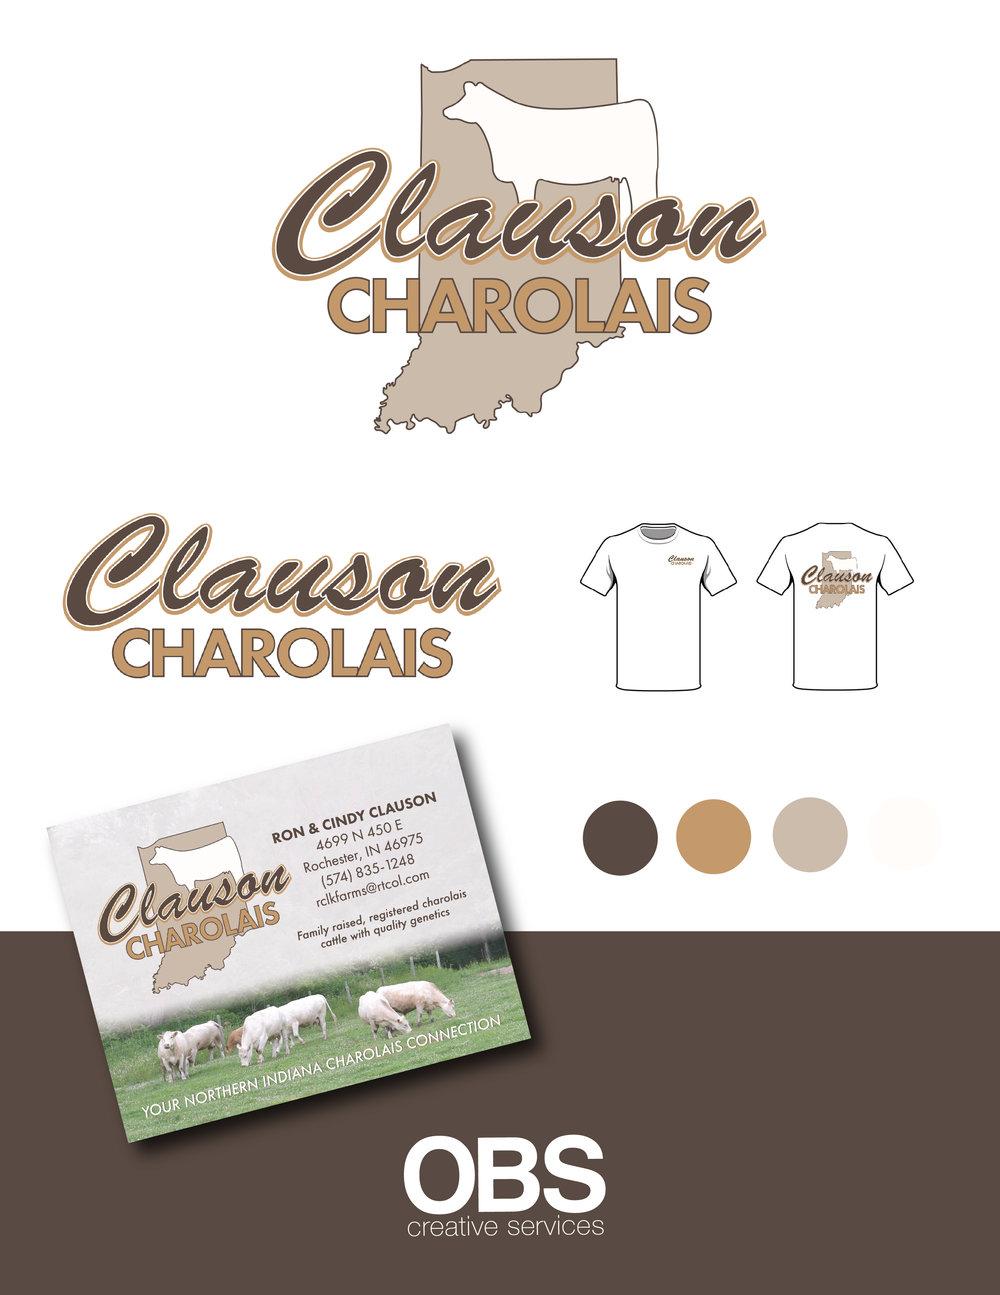 MCB Recruit CardClauson Charolais.jpg